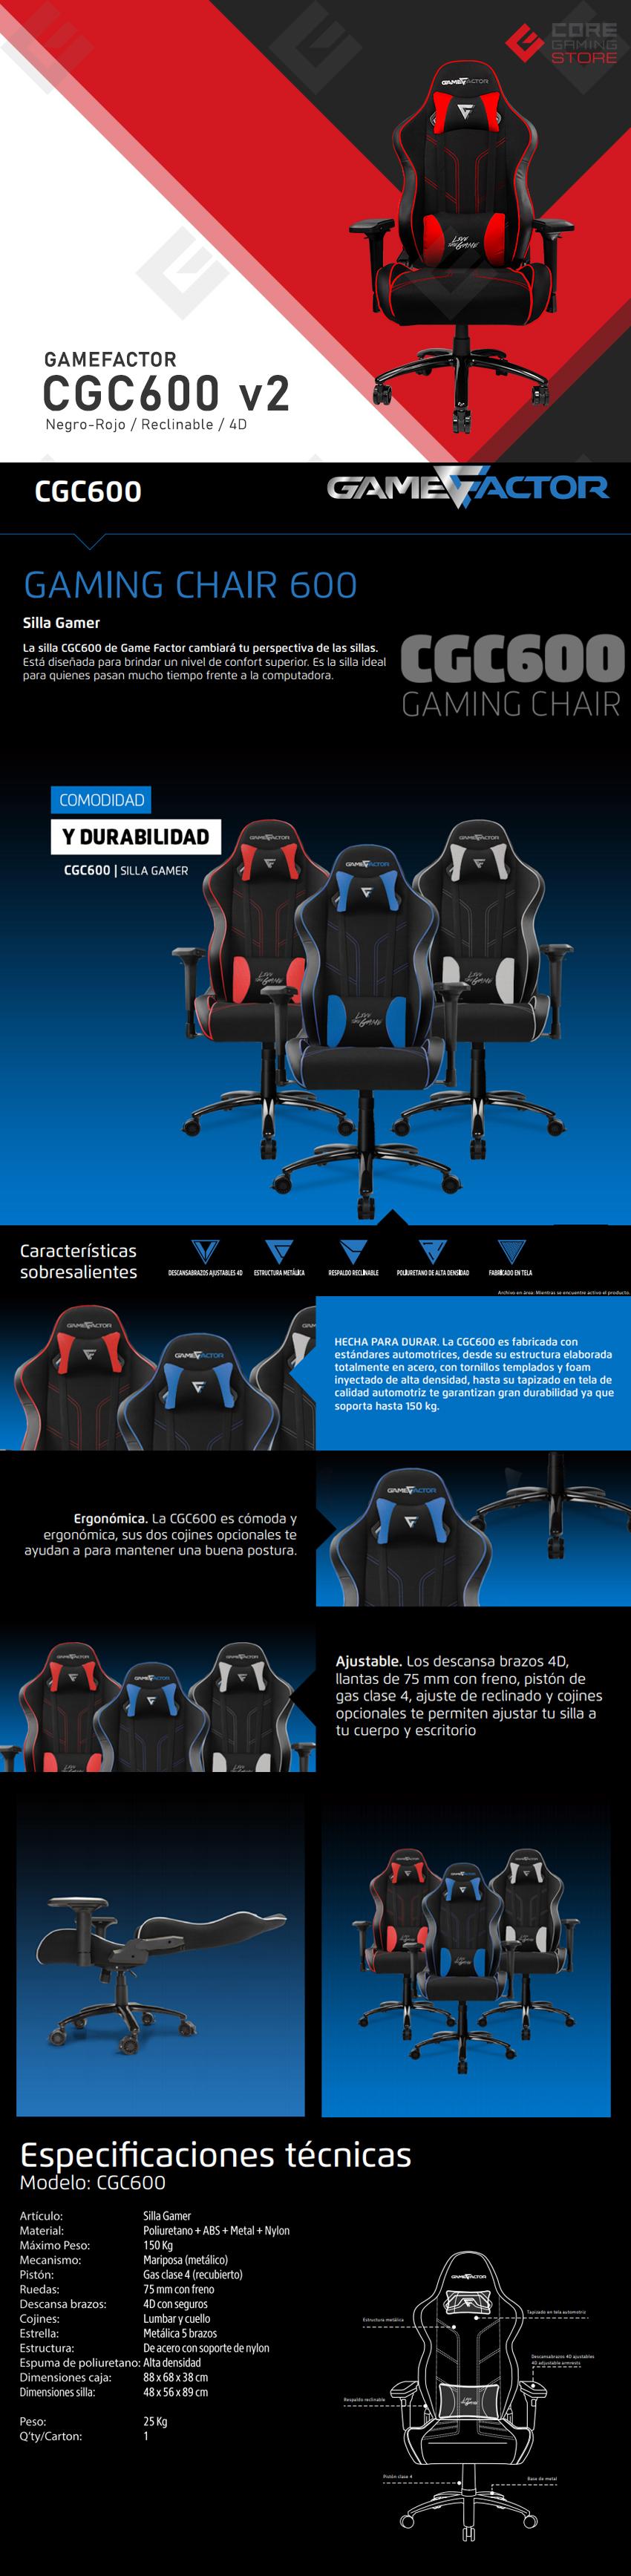 Silla Gamer GameFactor CGC600 v2, Negro/Rojo, Reclinable, 4D, 150Kg, CGC600-RD